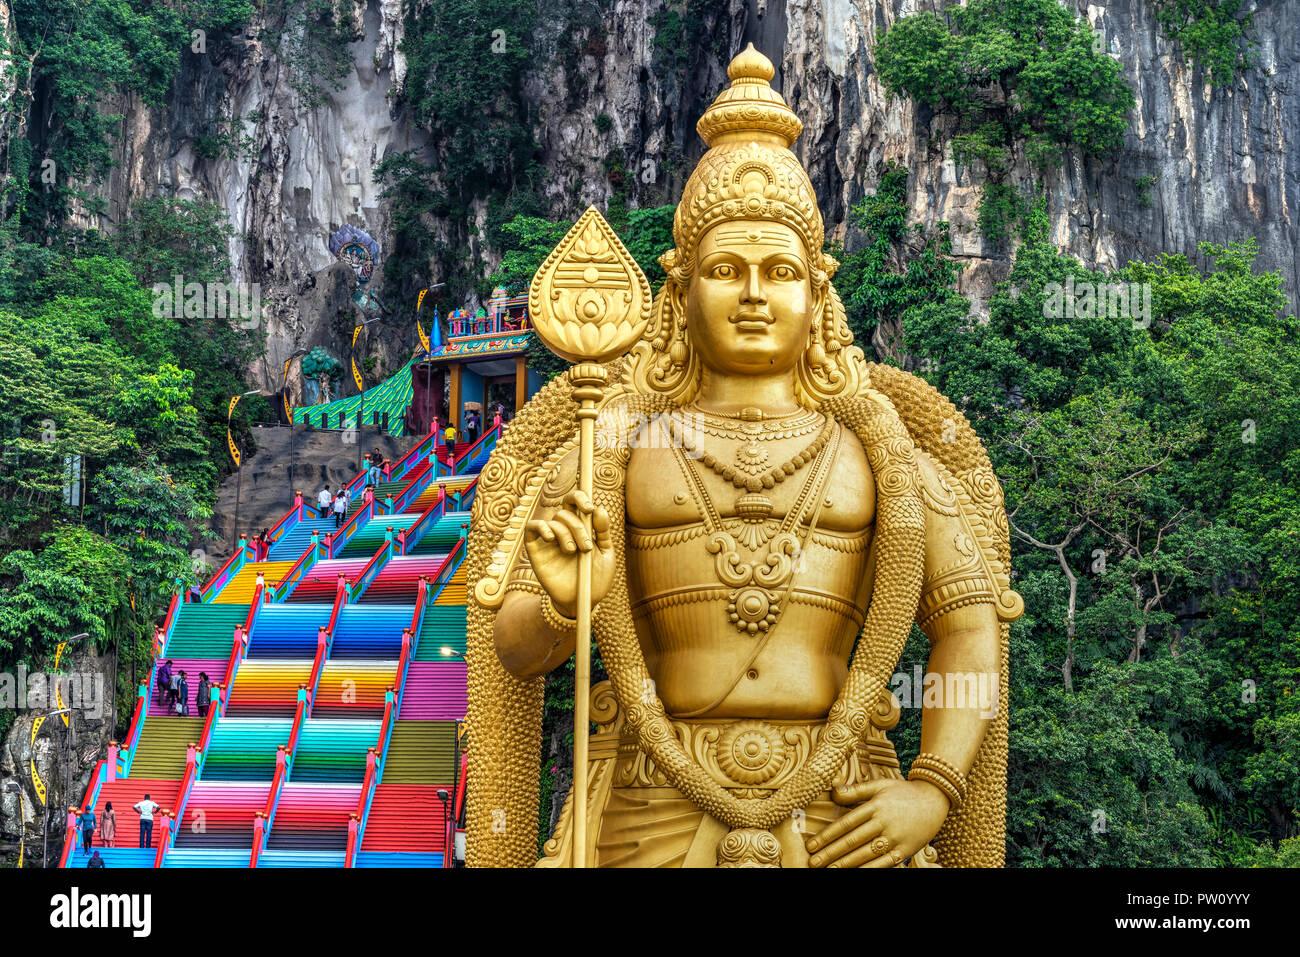 Eingang zum Batu Höhlen mit dem Murugan Statue, Selangor, Kuala Lumpur, Malaysia Stockbild